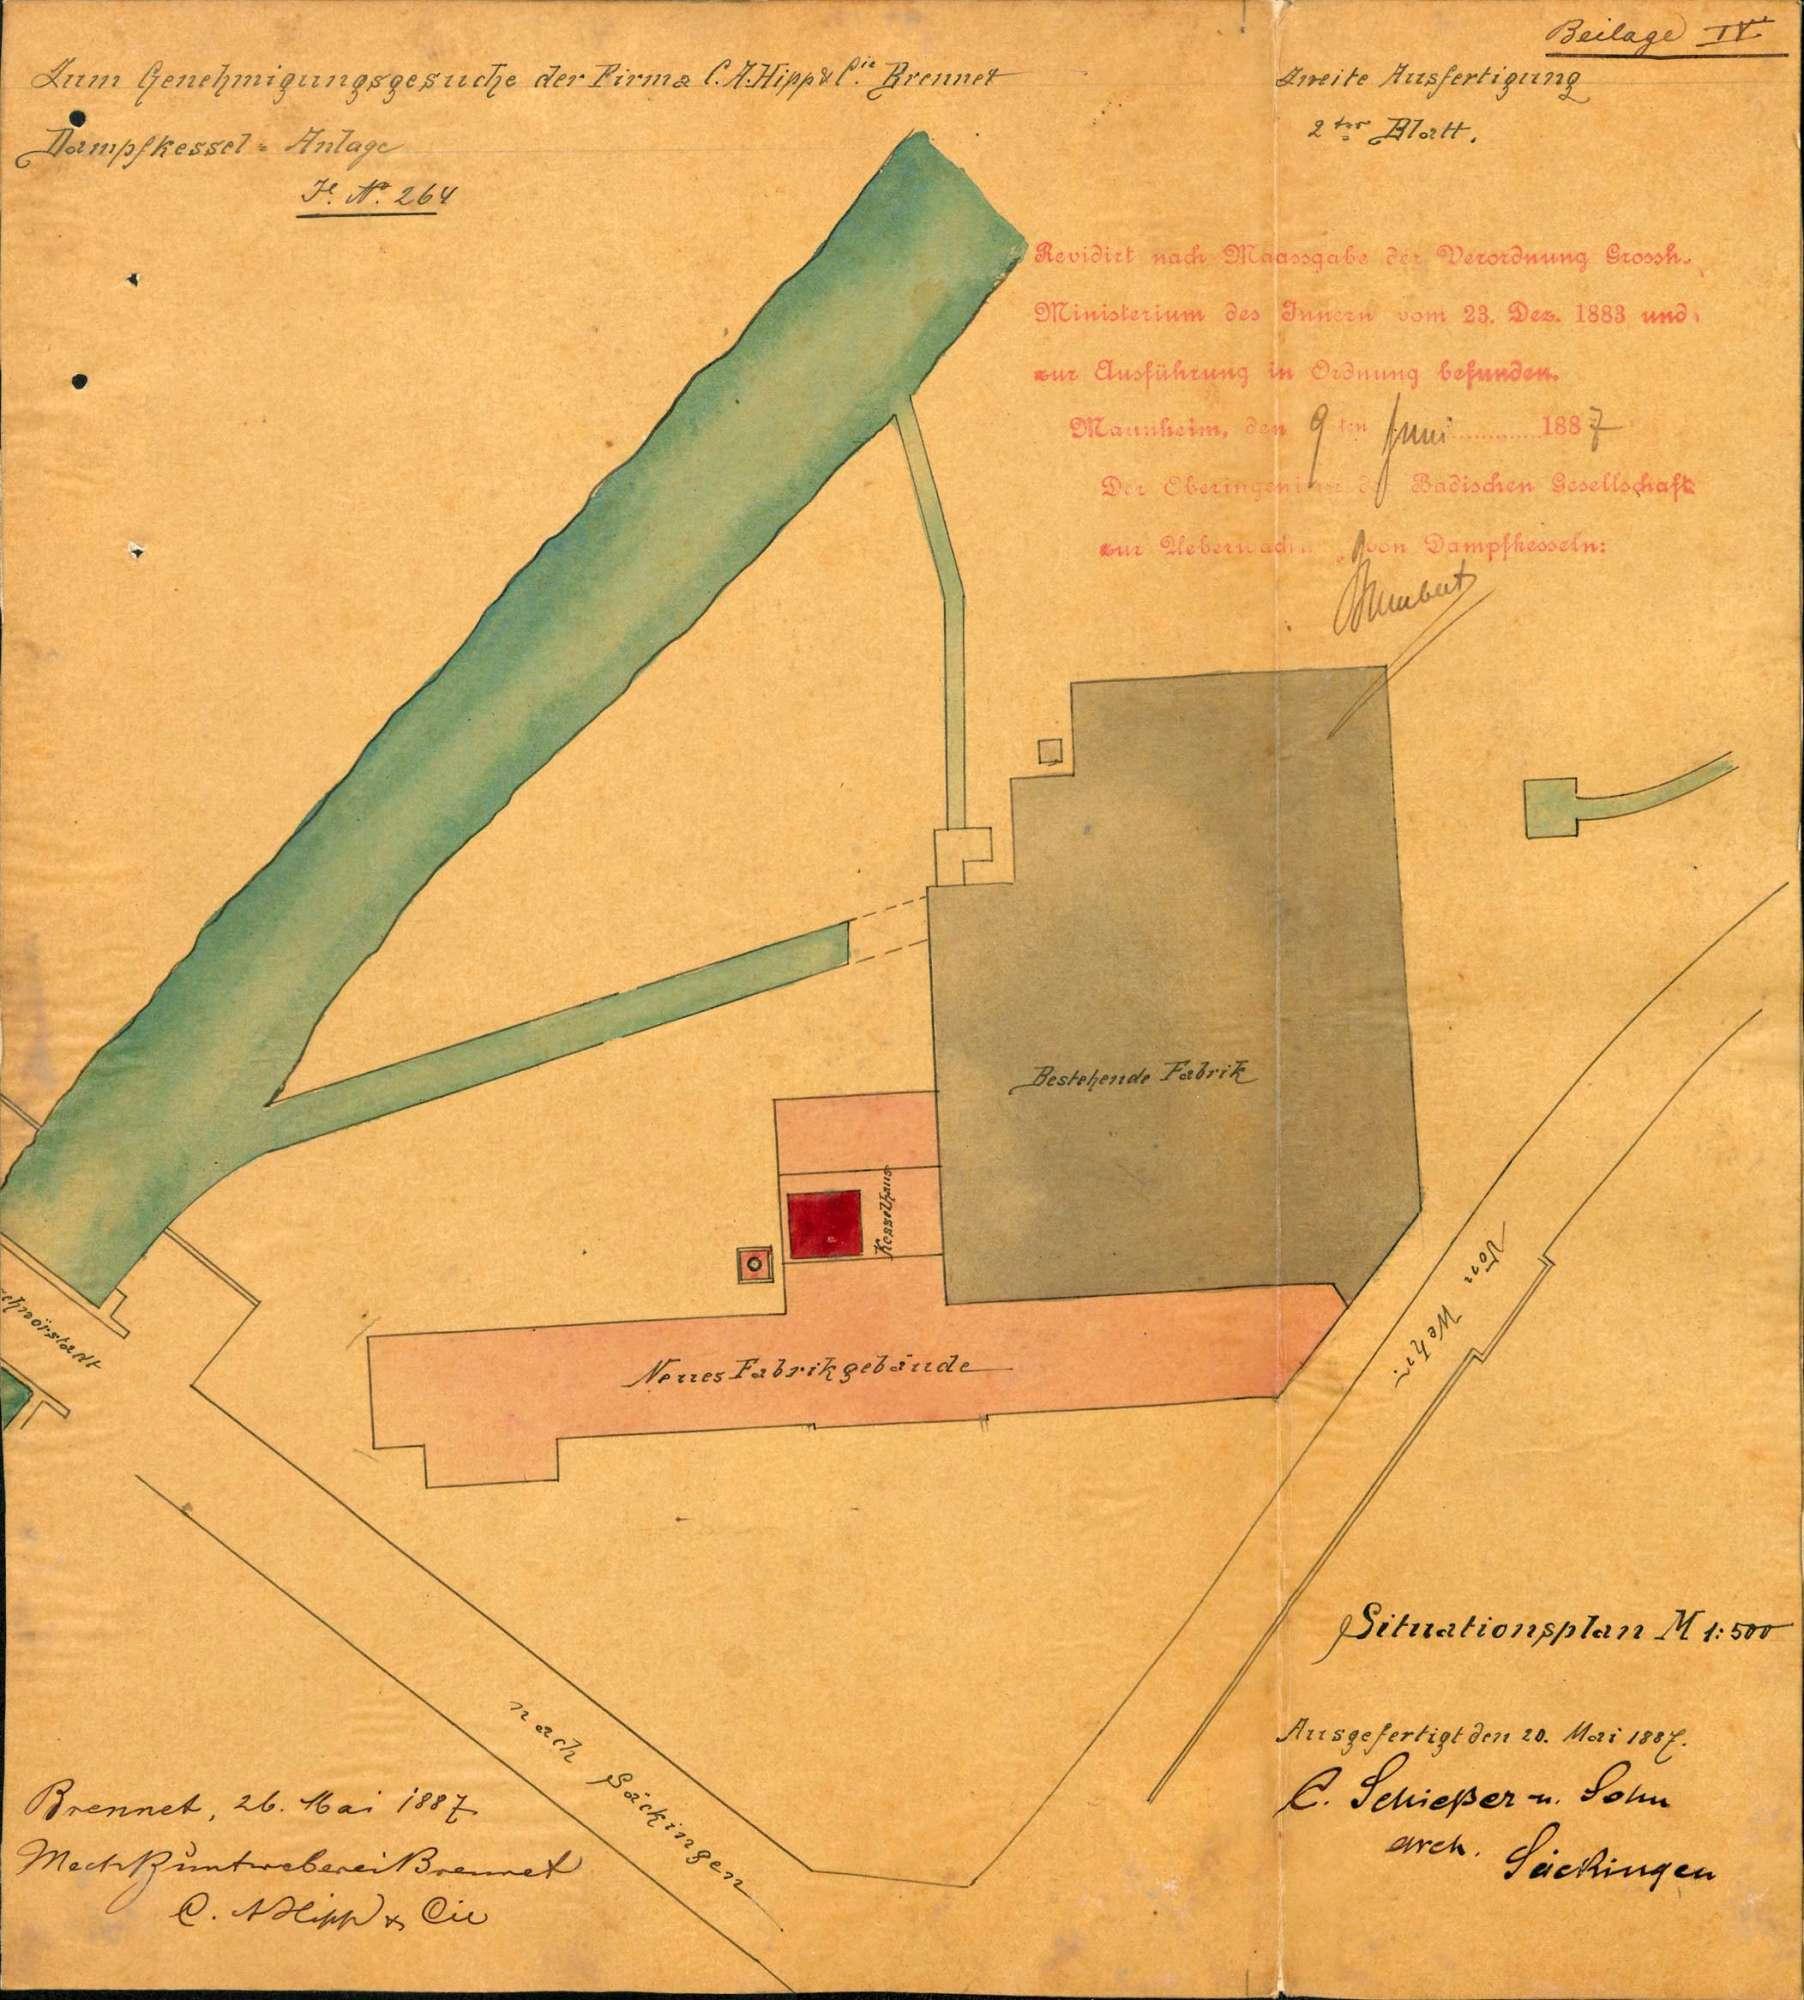 Dampfkessel der Firma C. A. Hipp & Co., Mechanische Buntweberei Brennet, in Brennet, Bild 1